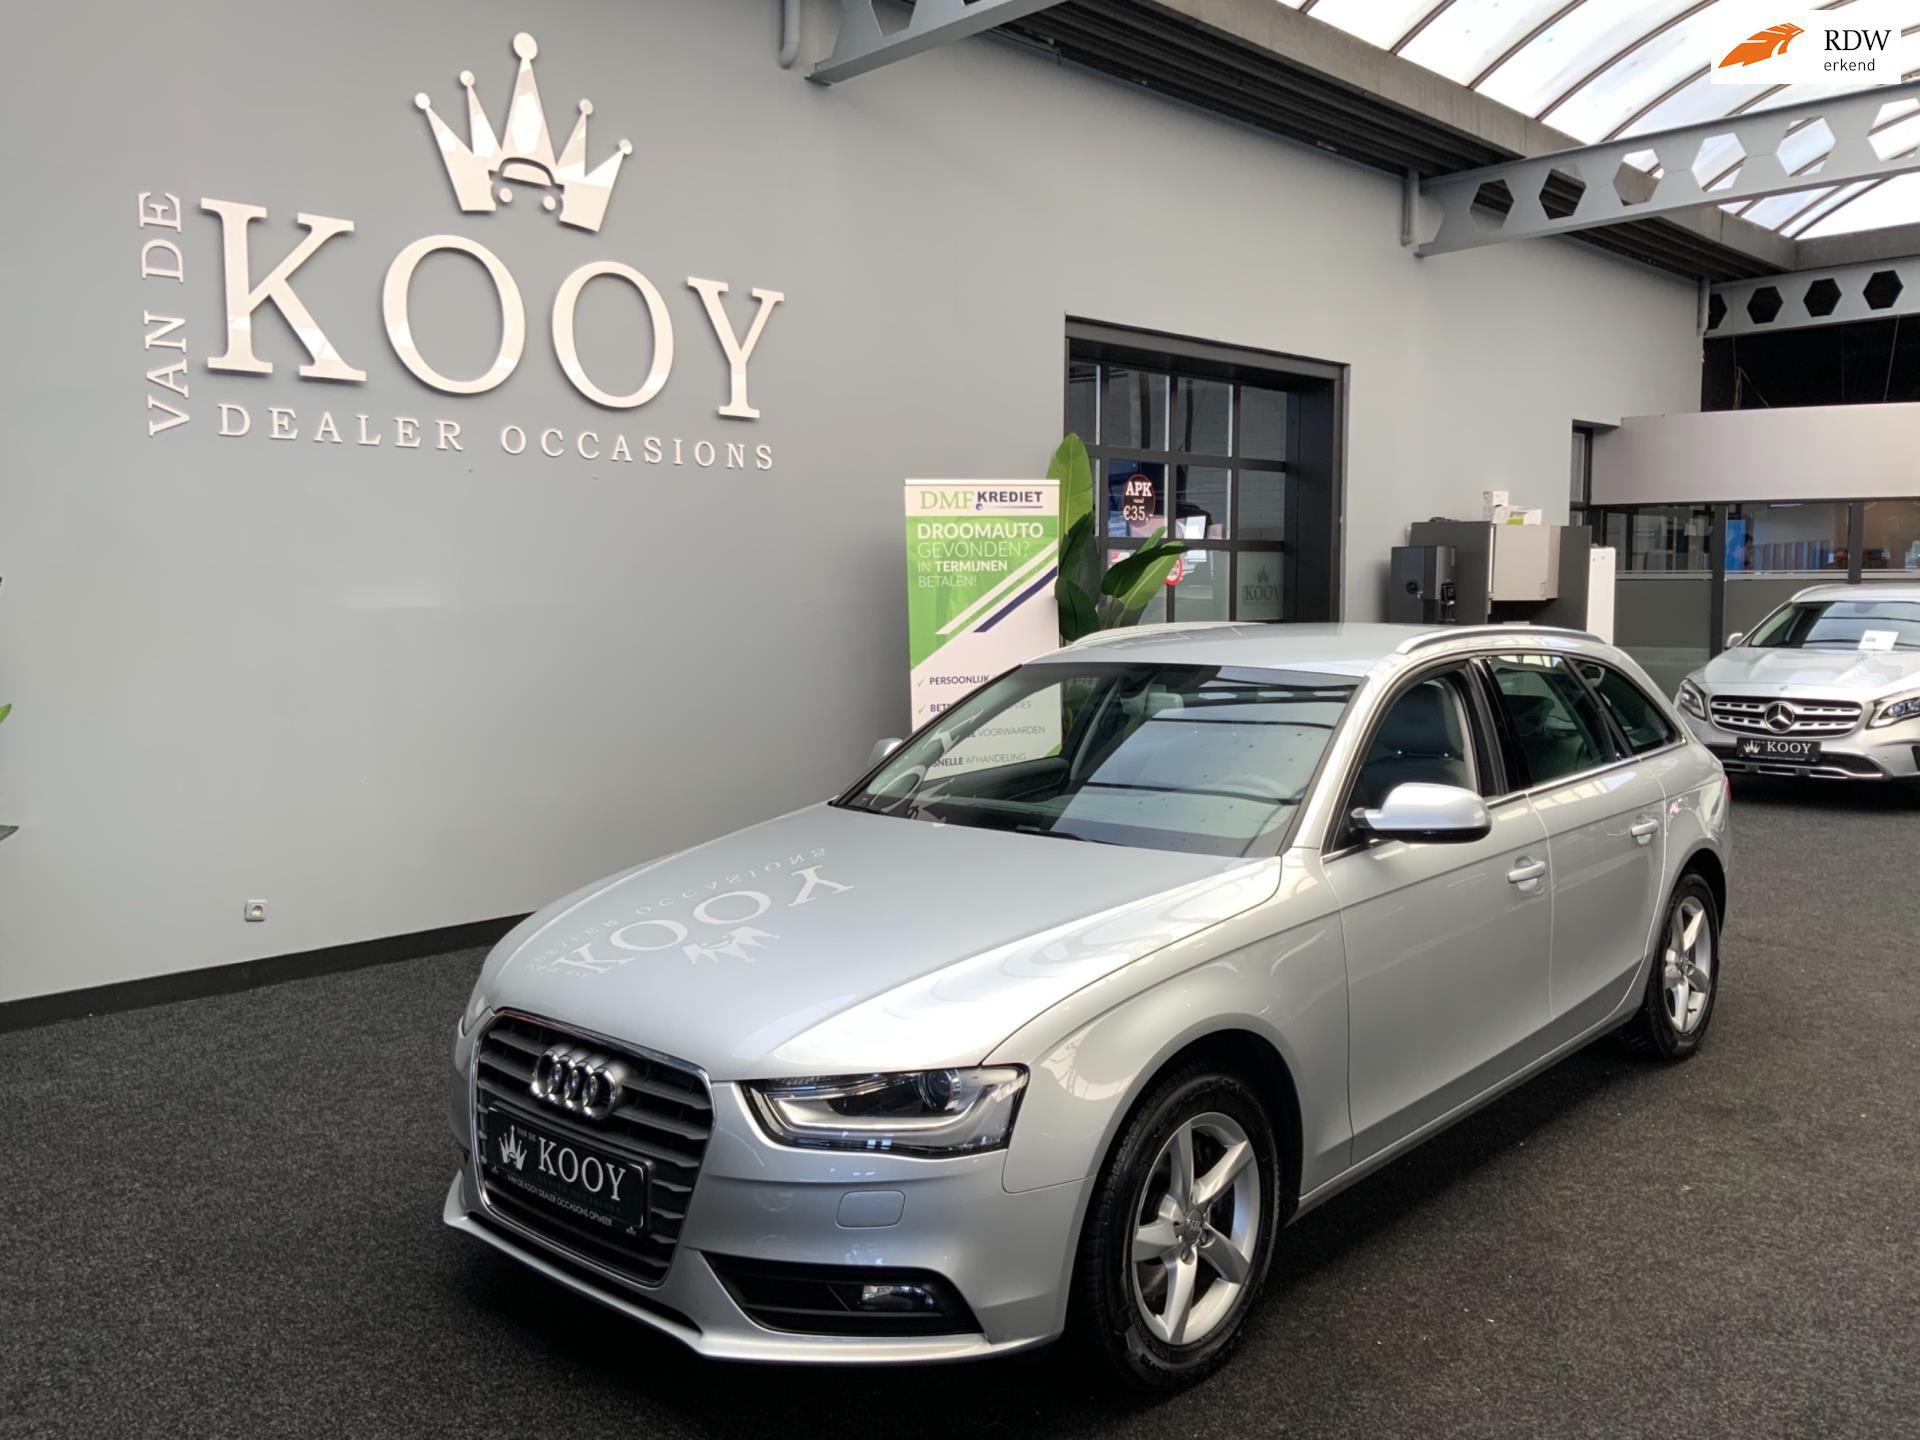 Audi A4 Avant occasion - Van De Kooy Dealer Occasions Opmeer